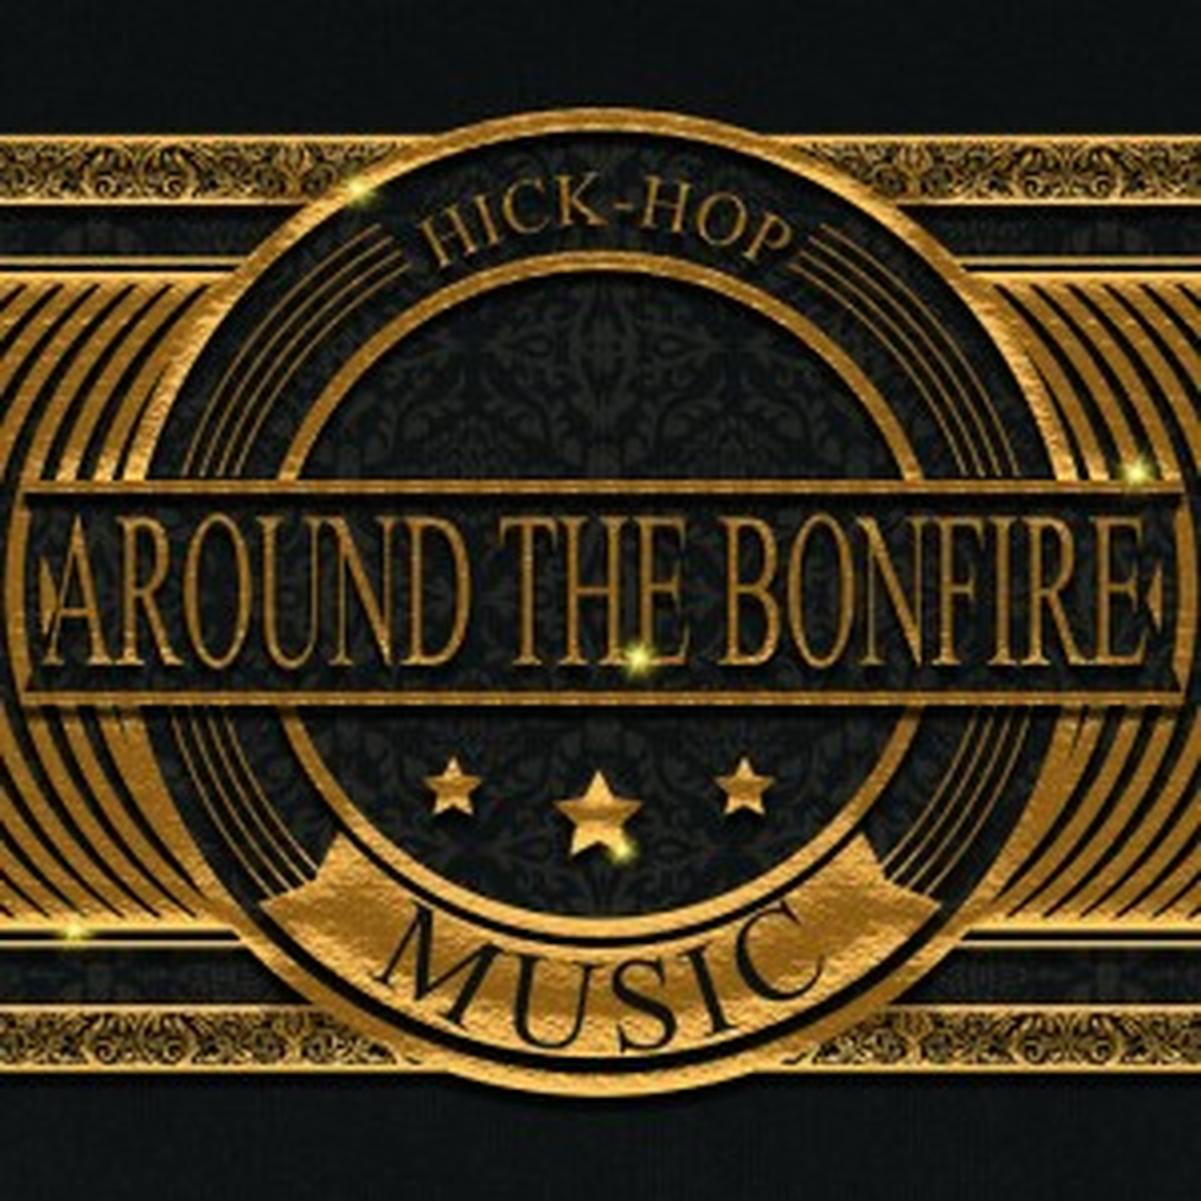 aroundthebonfire